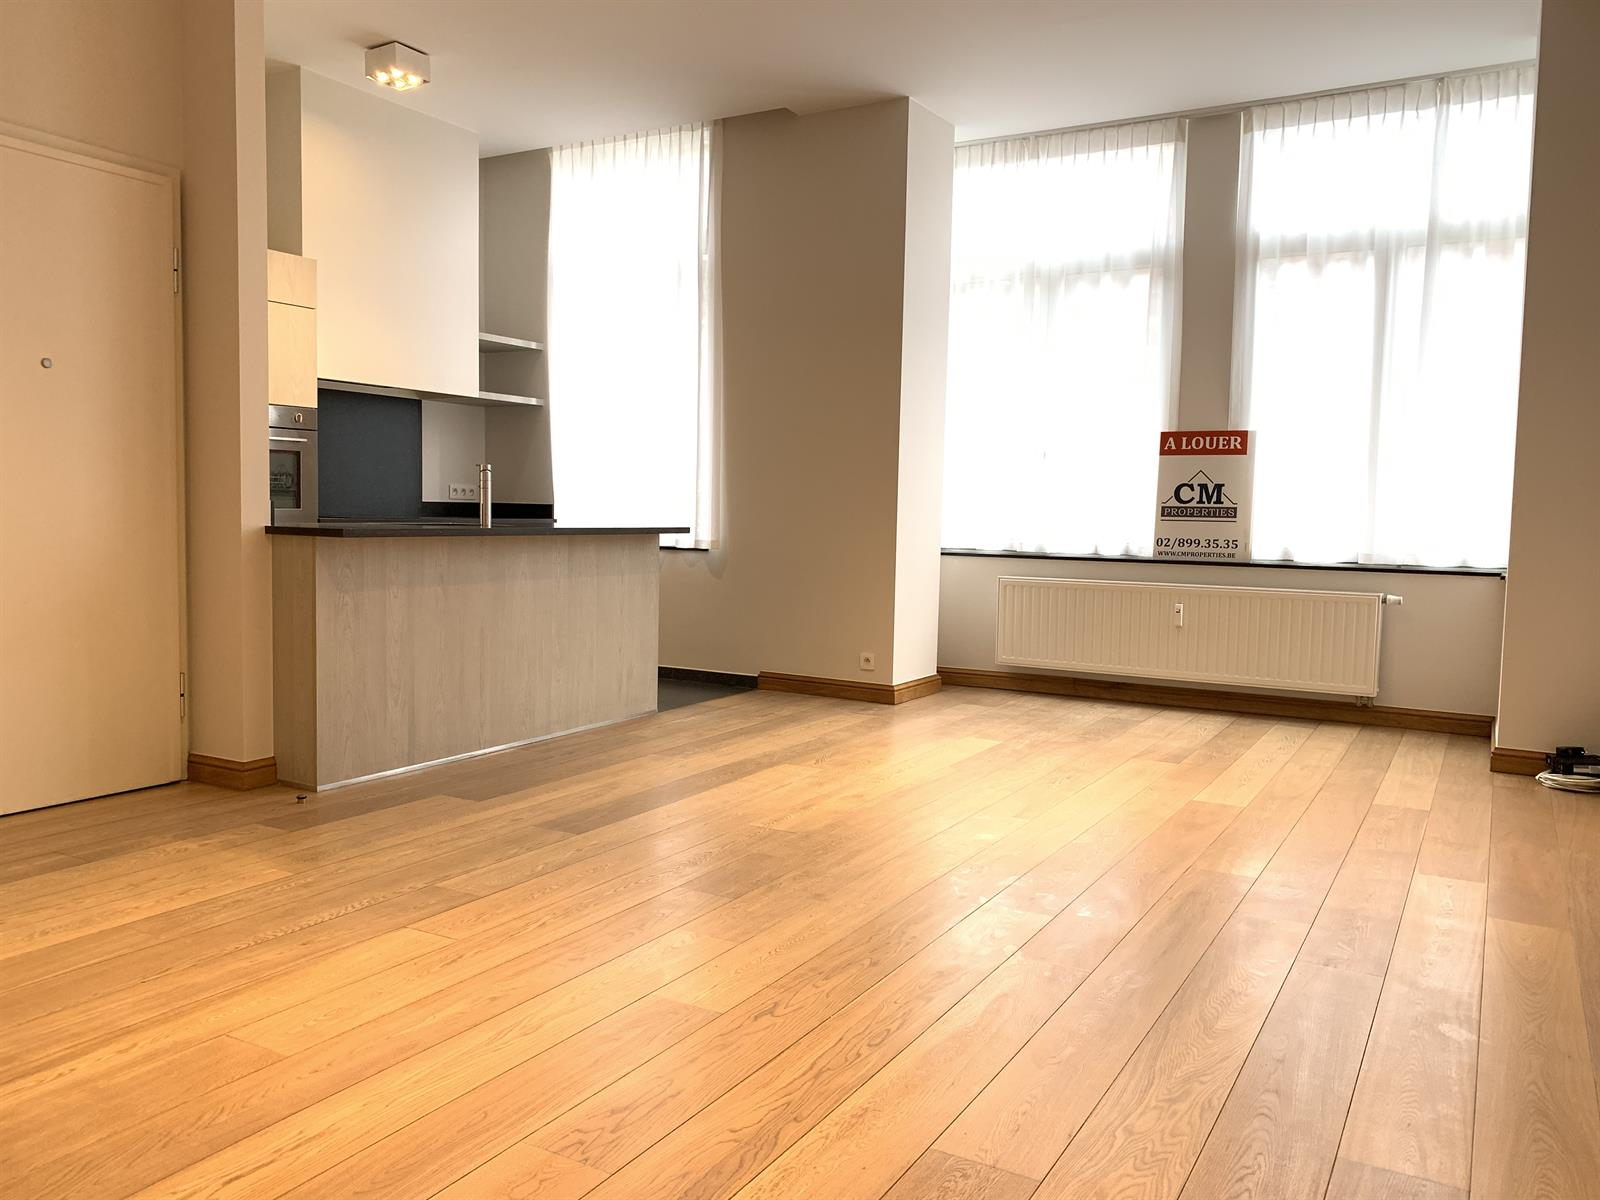 Exceptional apartment  - Bruxelles - #3972754-1